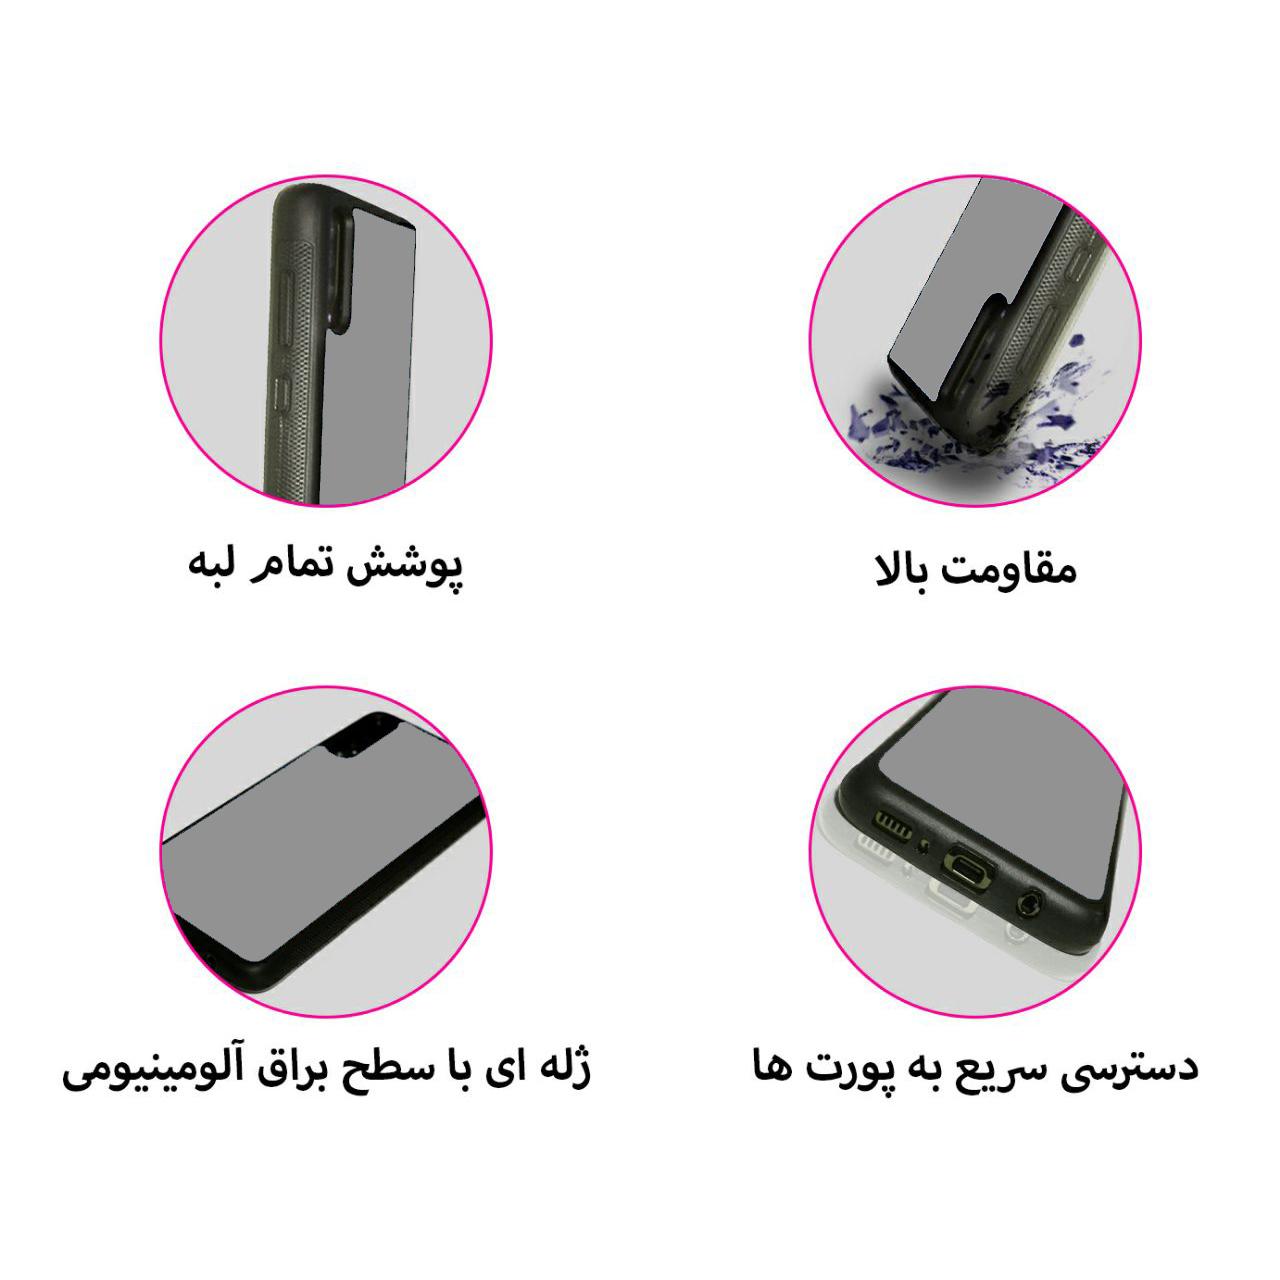 کاور مدل gsh طرح گ مناسب برای گوشی موبایل اپل iphone 5/5s